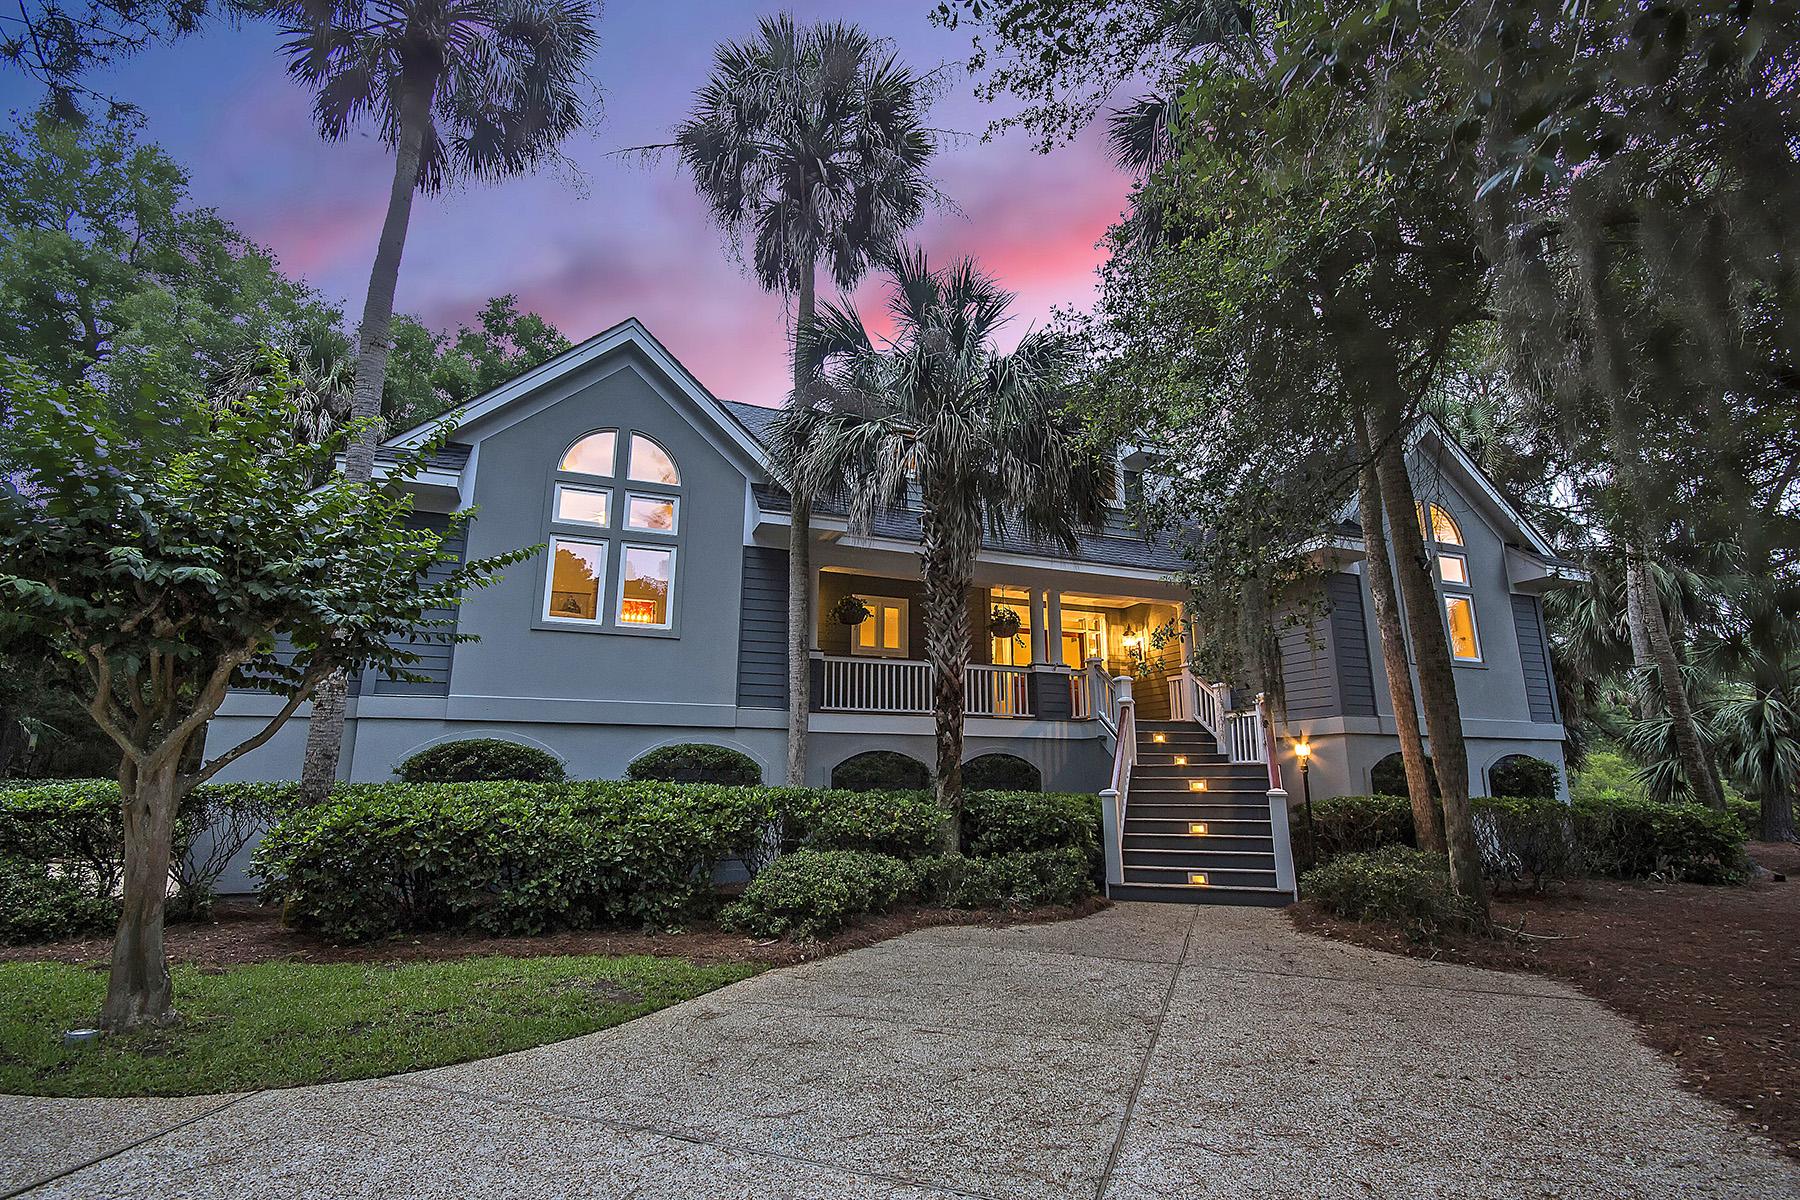 Single Family Homes for Active at 195 Governors Drive Kiawah Island, South Carolina 29455 United States